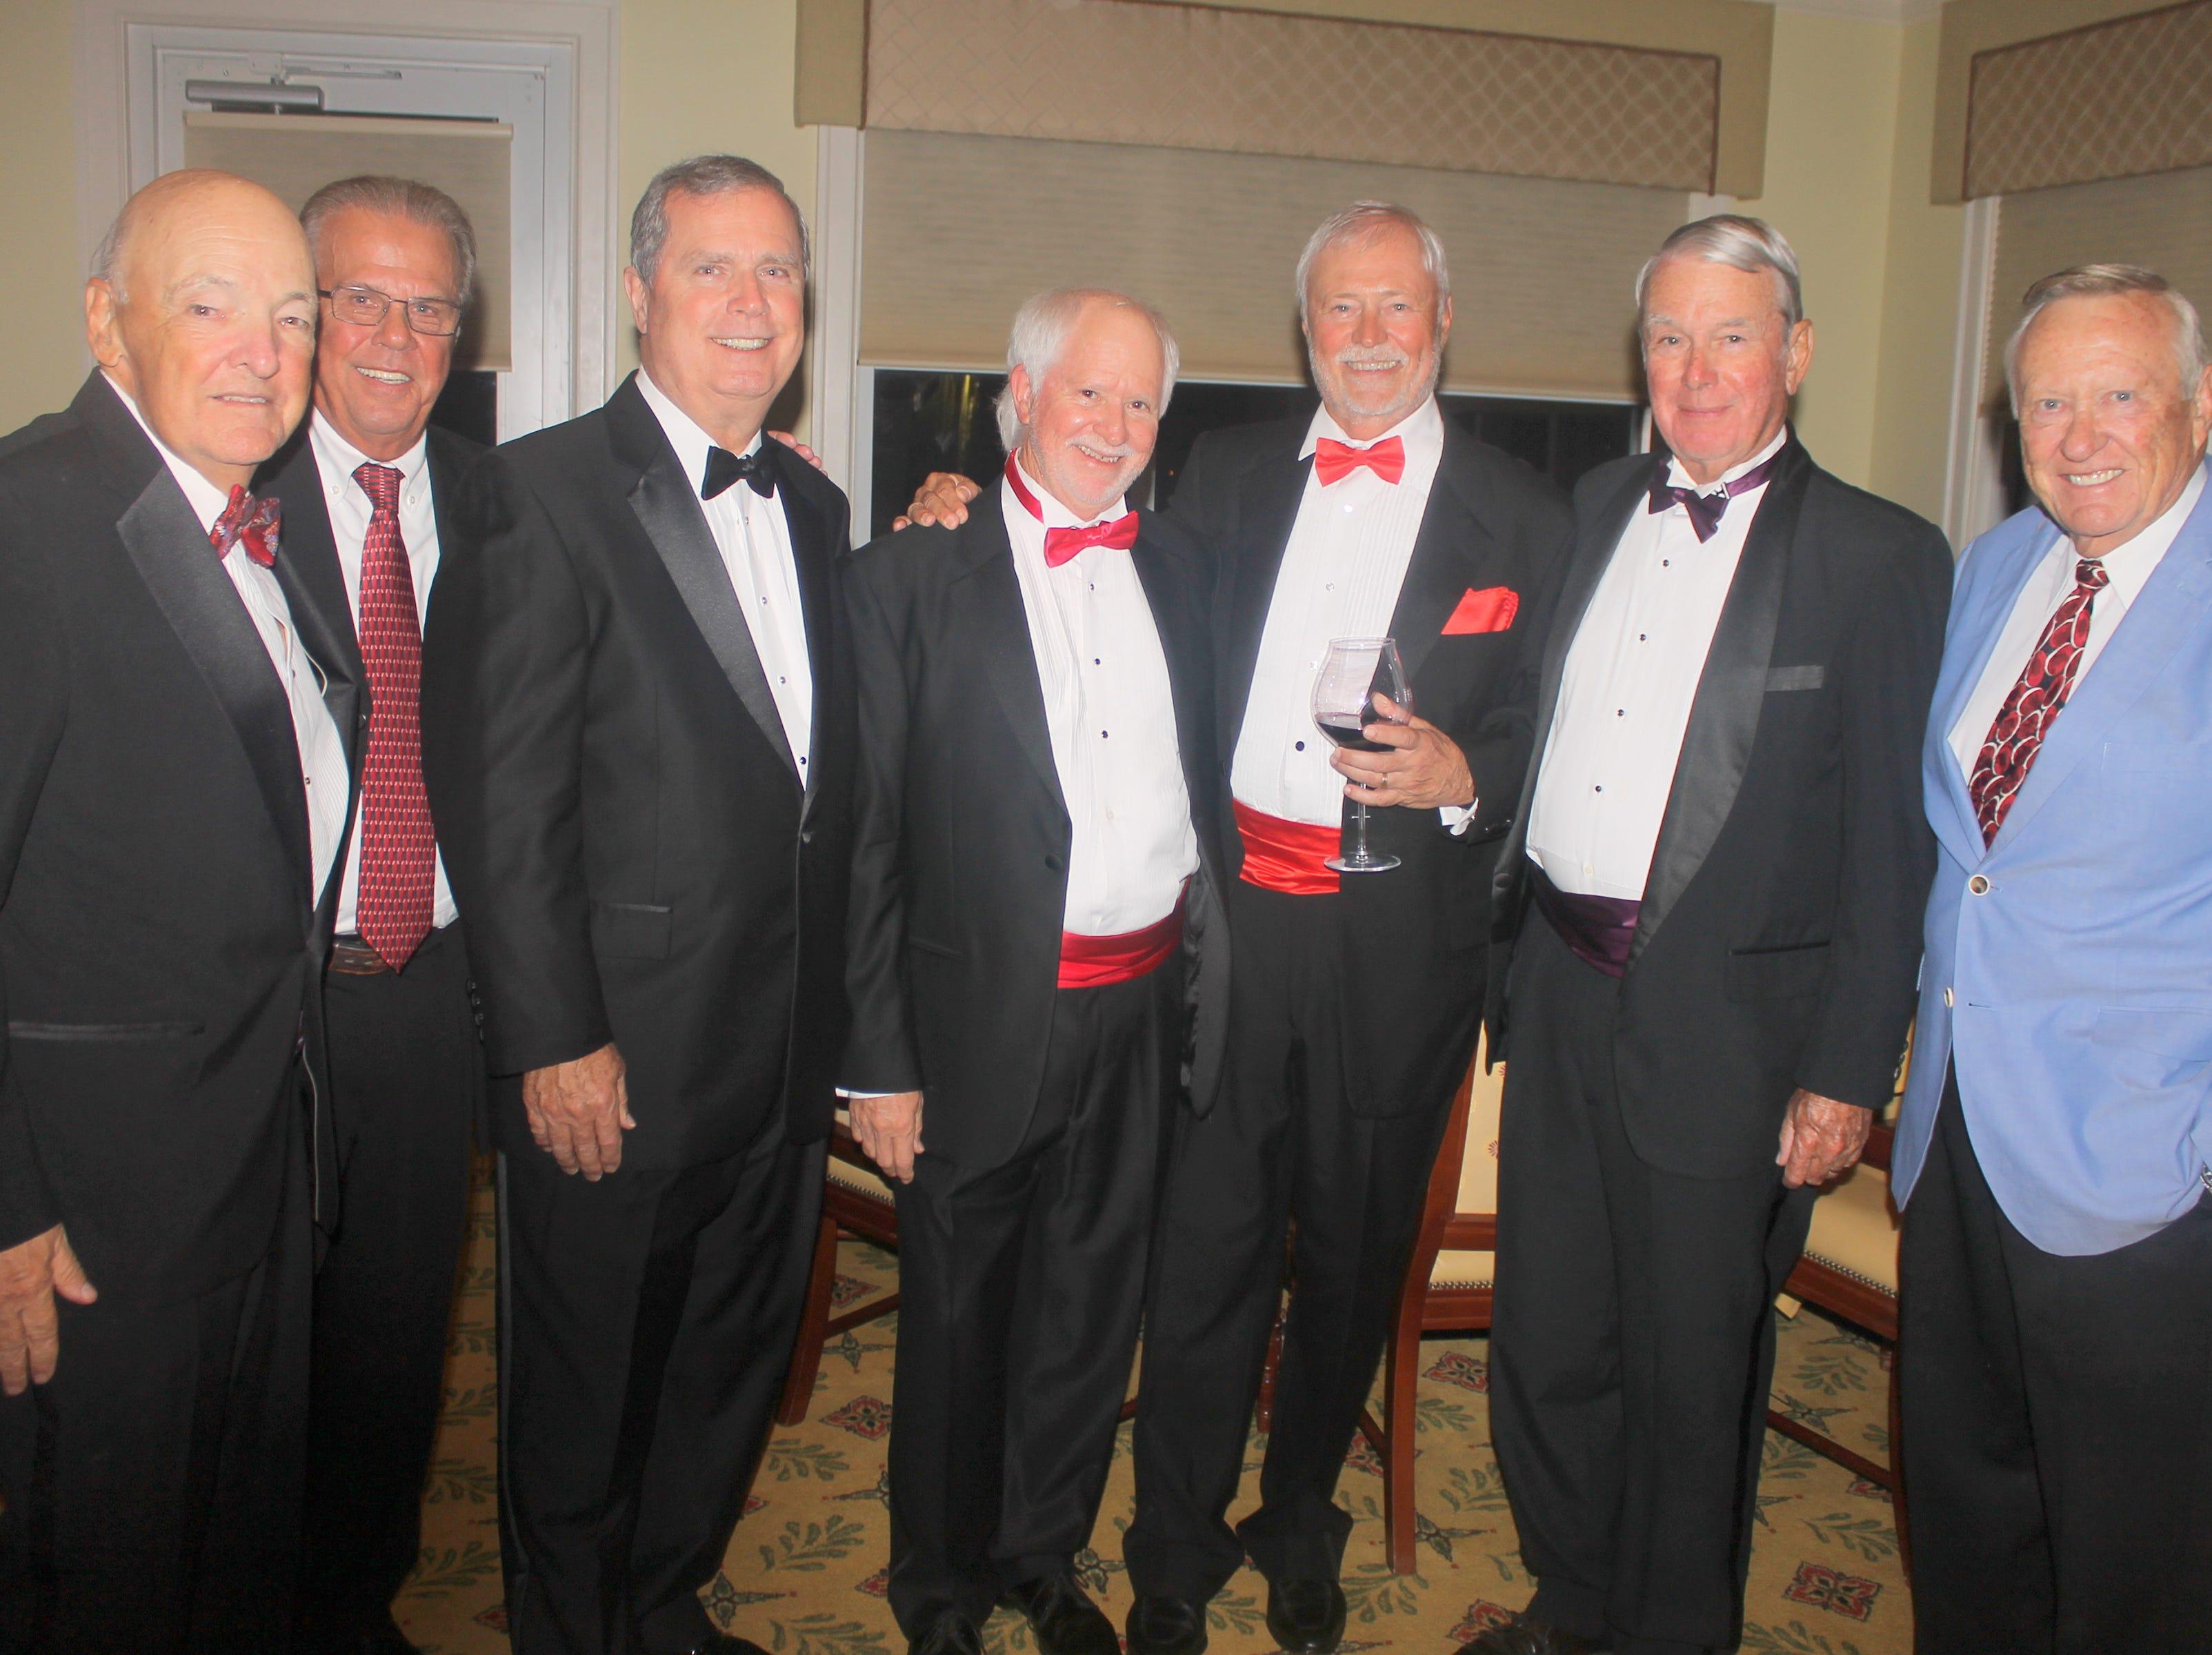 Such dapper looking gentlemen: Randle Grossman, Jerry Defibaugh, Jeff Dywan, Ed Crane, Bill Rogers, Dave Walsh and Silky Sullivan.